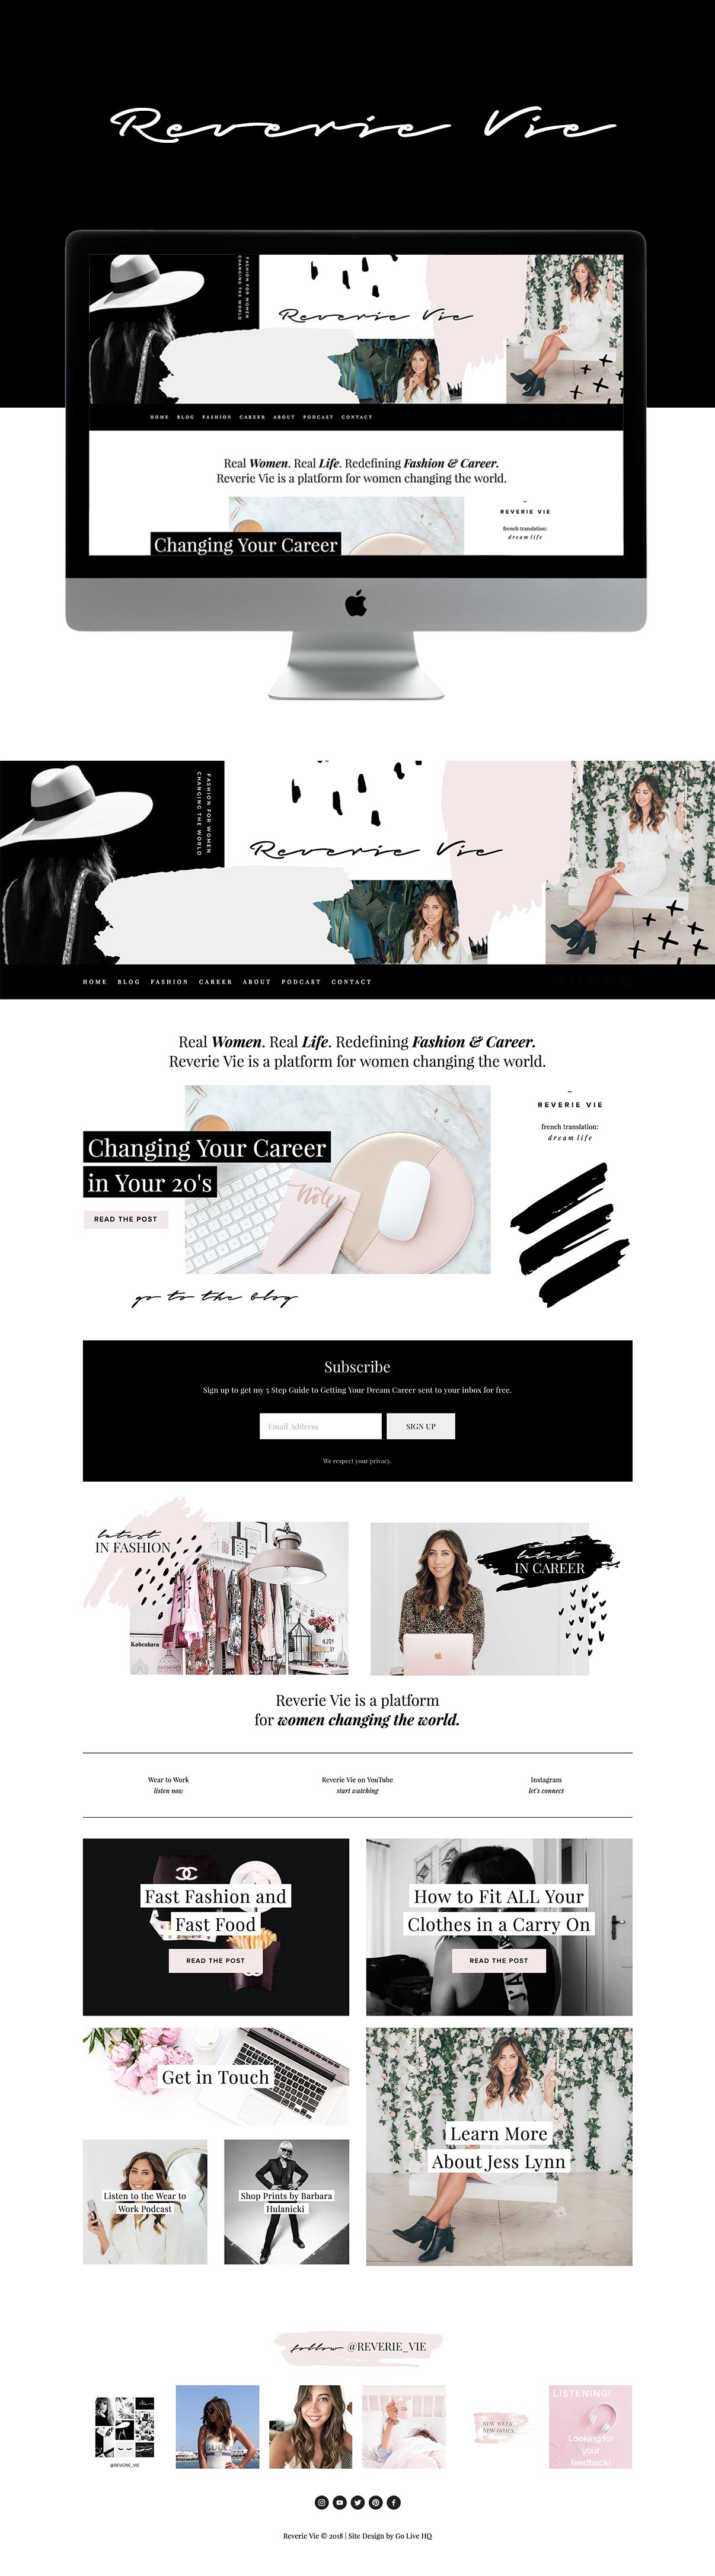 Bold, High-End, Creative Website Design for Fashion Blogger | Design by Go Live HQ